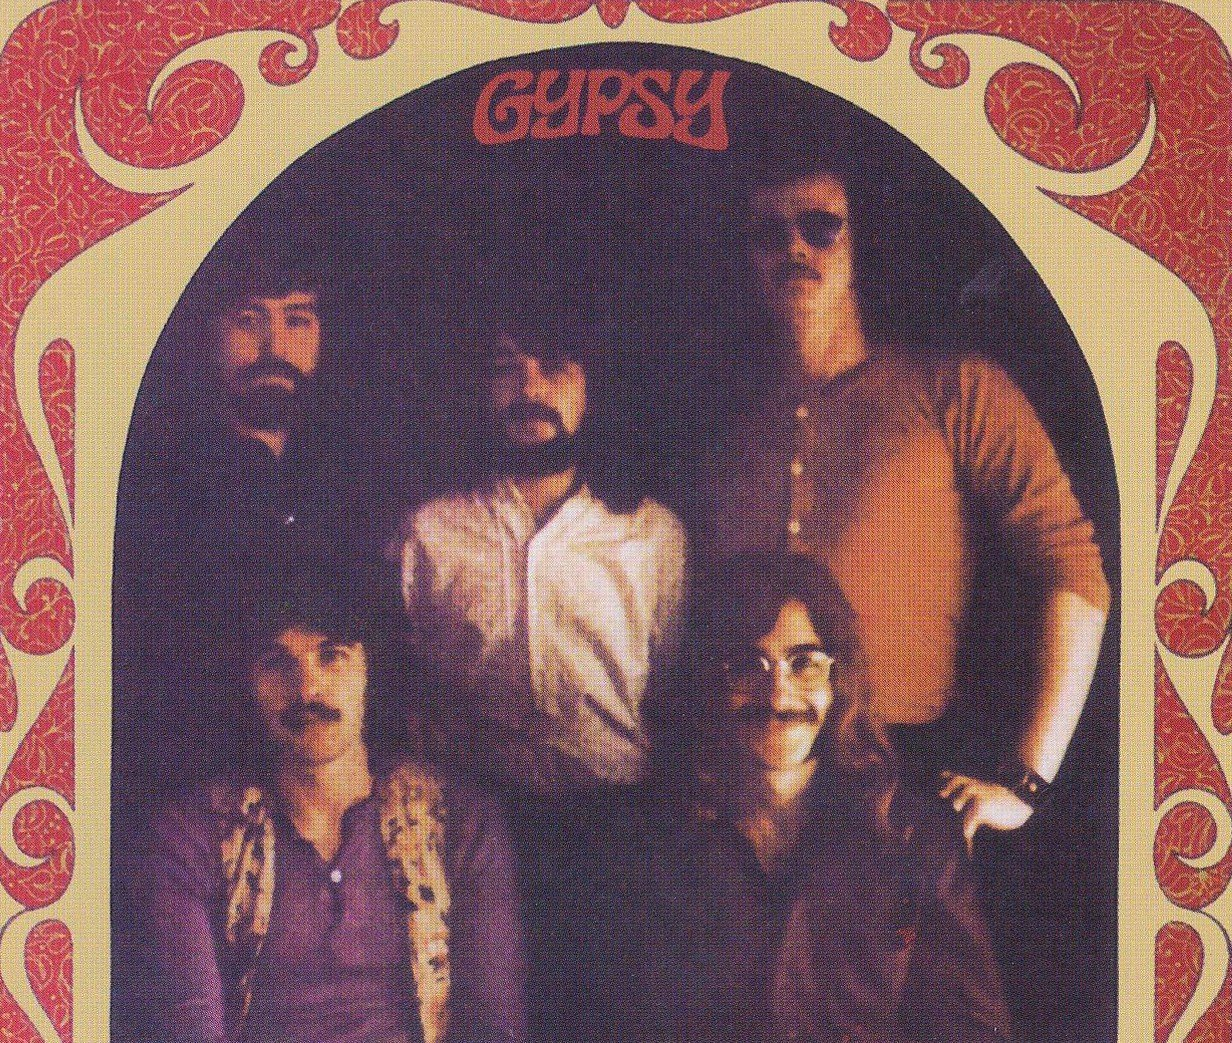 gypsy antithesis Gypsy antithesis download on rapidtrendcom rapidshare search engine - antithesis 11, gypsy music of constantinople turkish gypsies, gypsy hellmenn7.